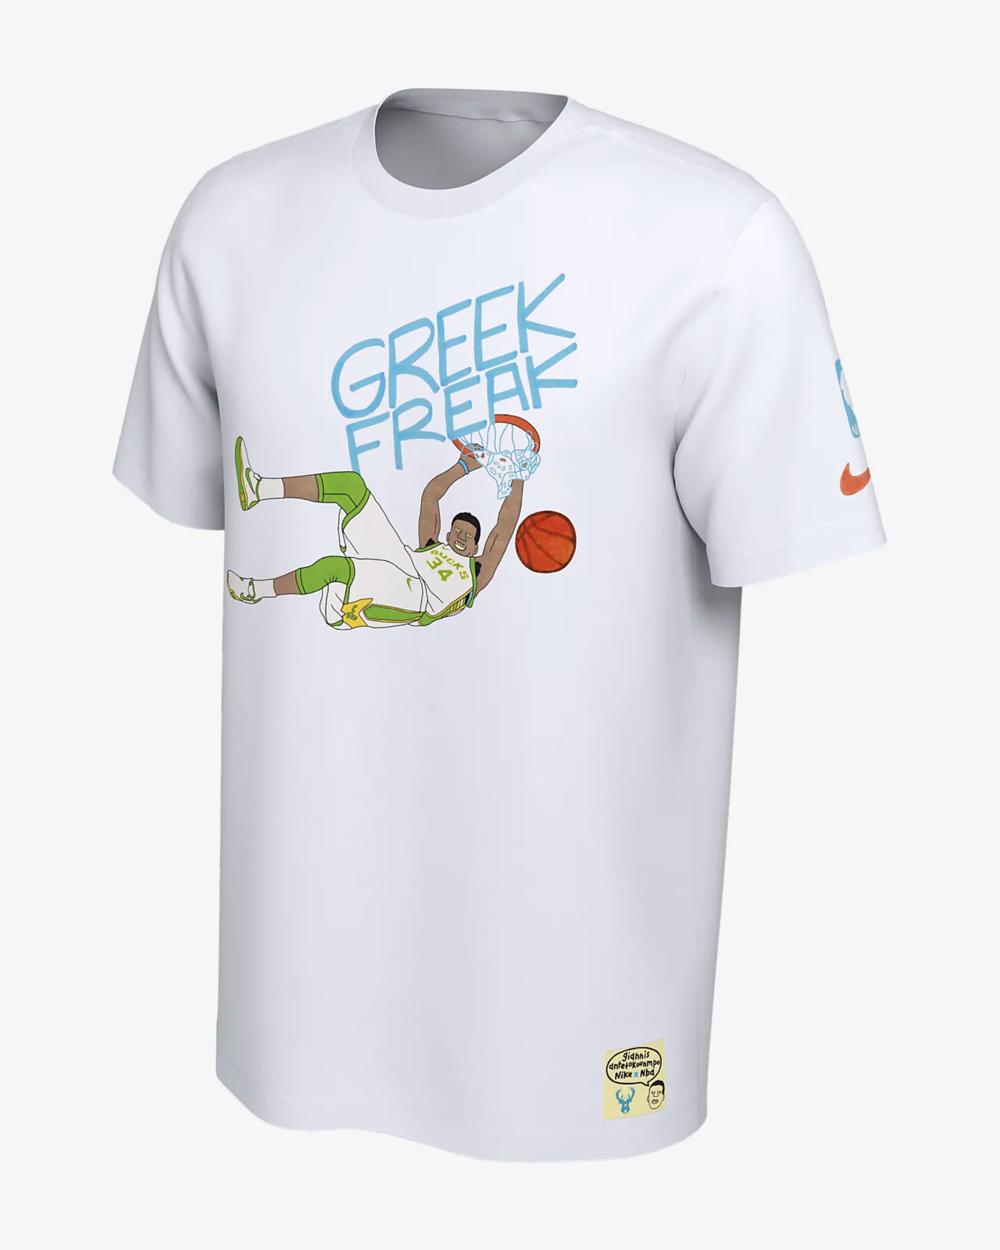 gangster-doodles-greek-freak-mens-nba-nickname-t-shirt-pSwl0m.png